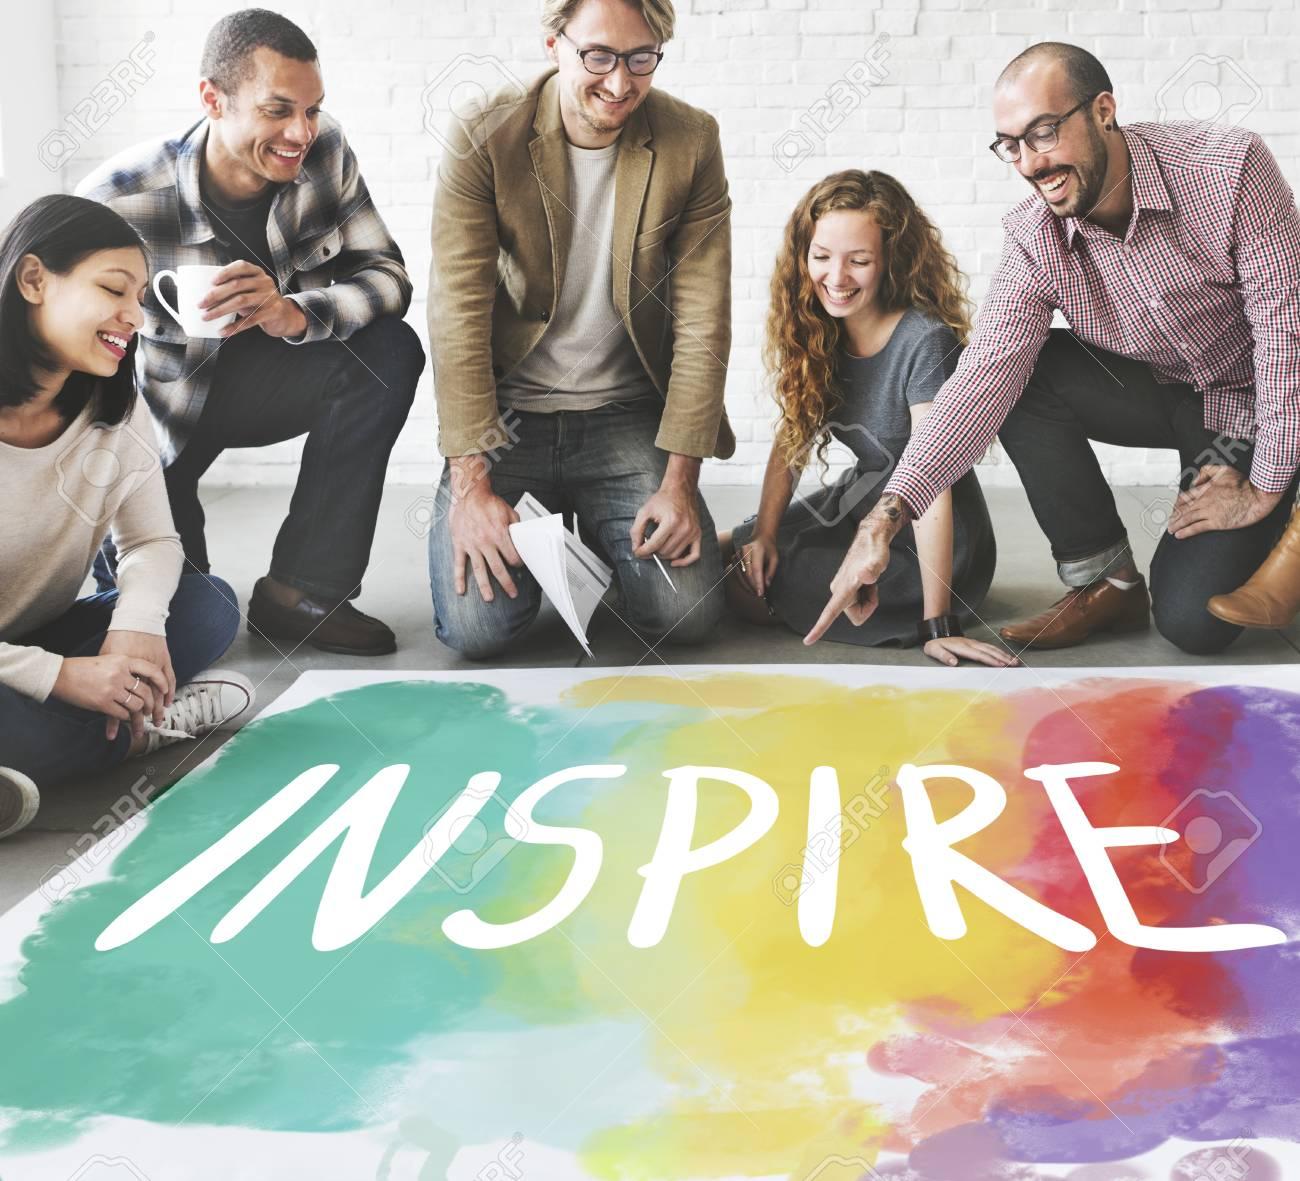 Desire Inspire Goals Follow Your Dreams Concept - 57954157